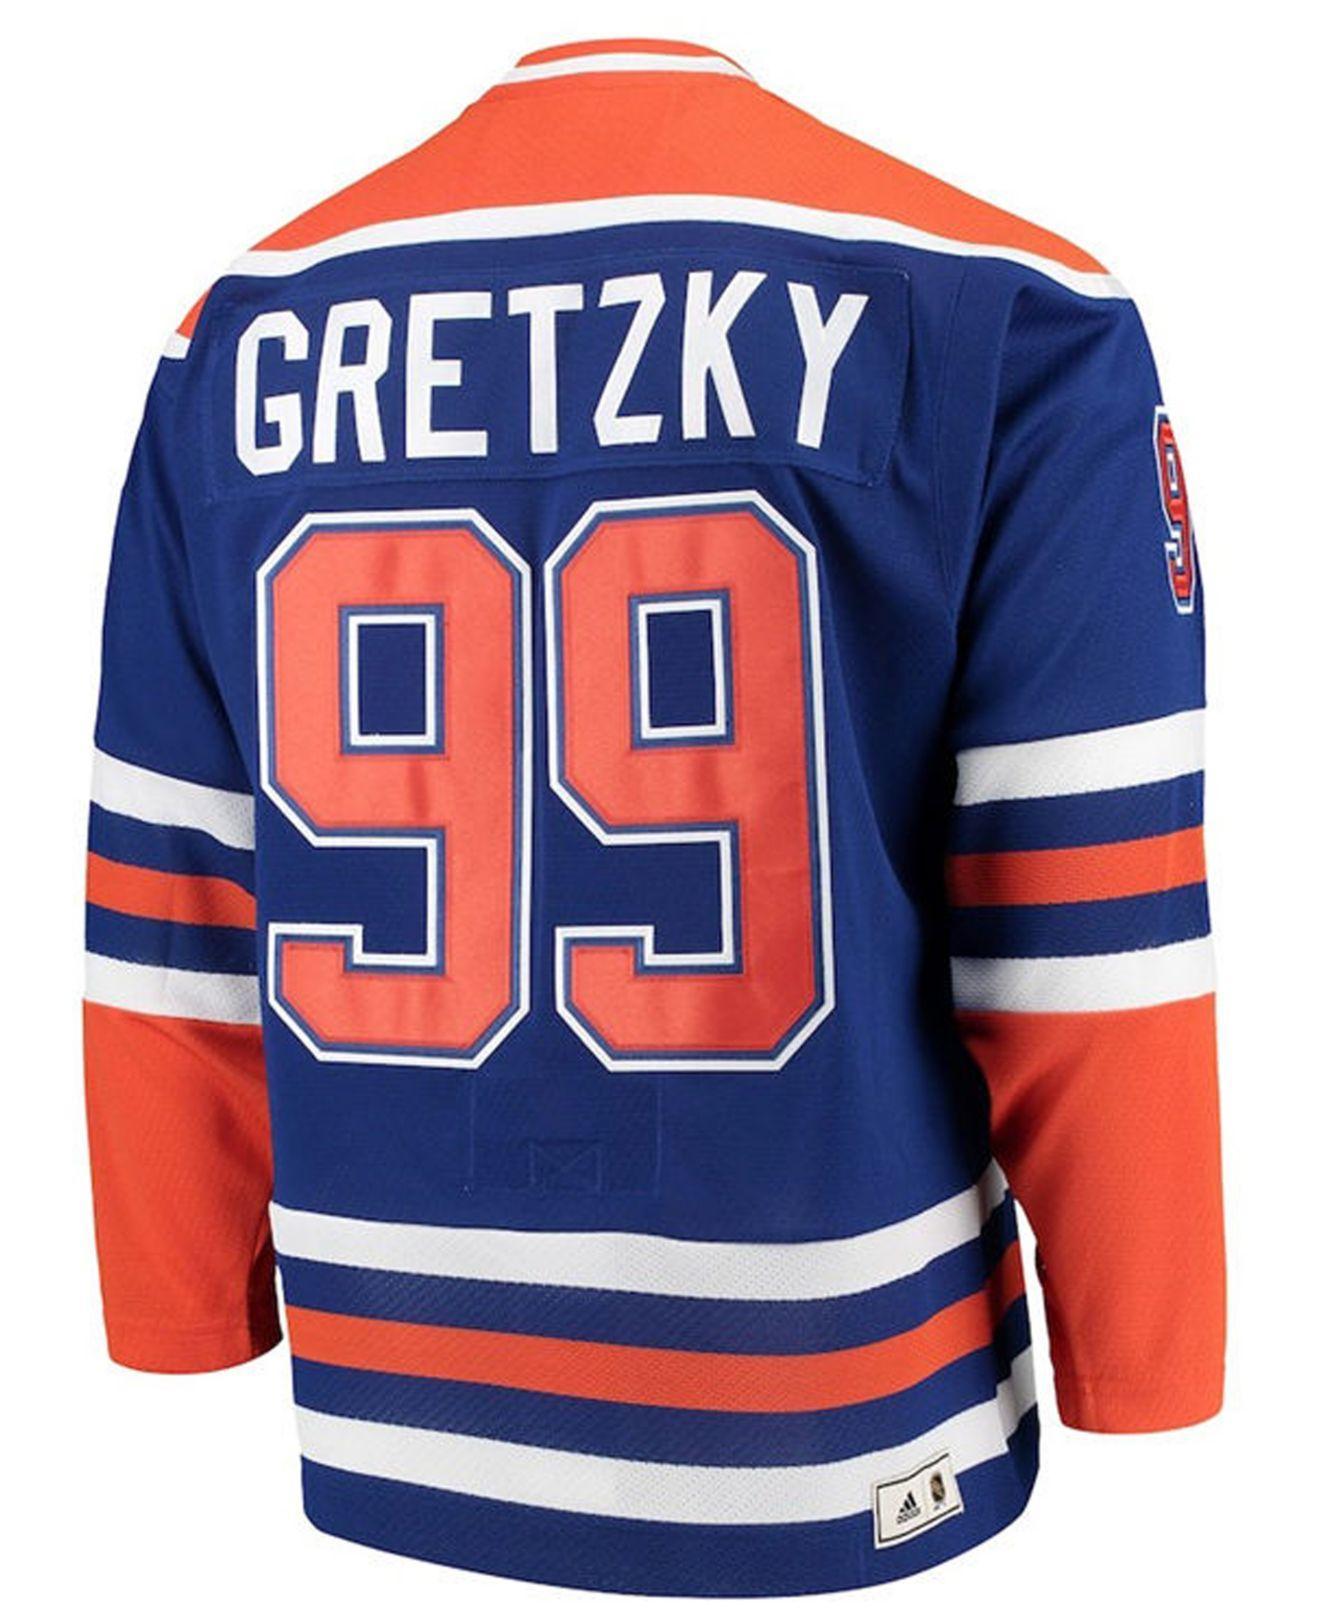 online store 92e93 efc02 Men's Blue Wayne Gretzky Edmonton Oilers Heroes Of Hockey Classic Jersey